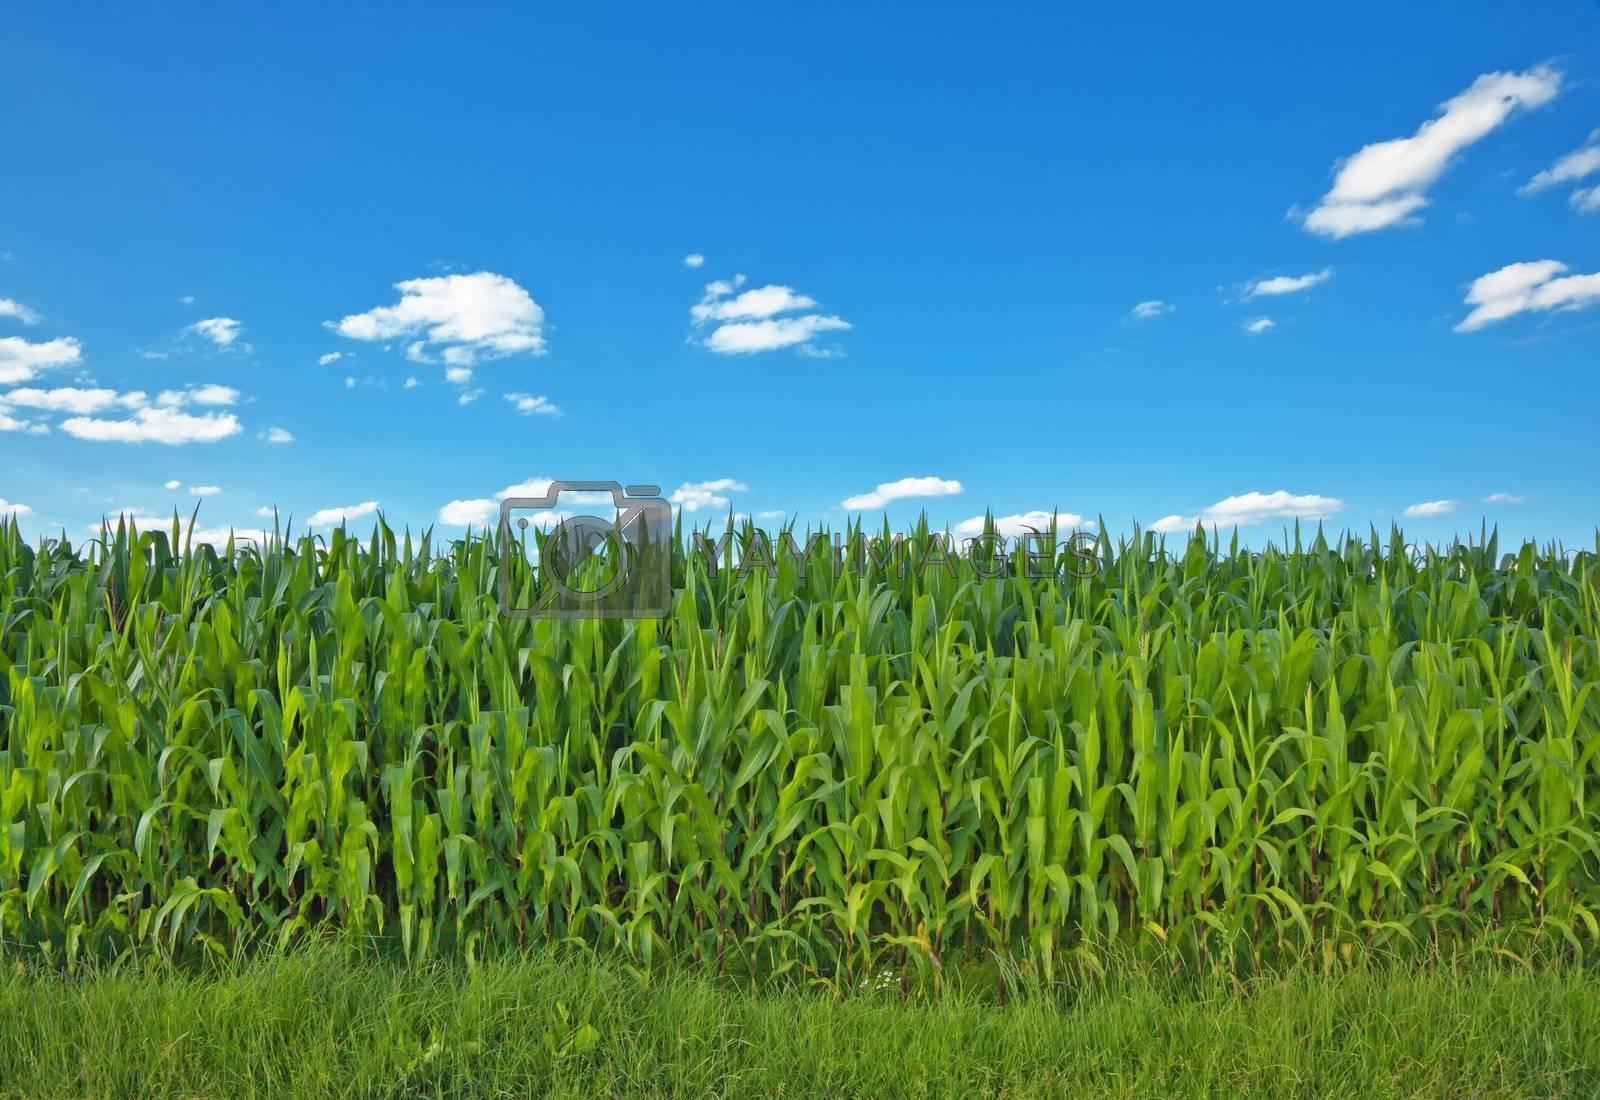 A photography of a beautiful corn field